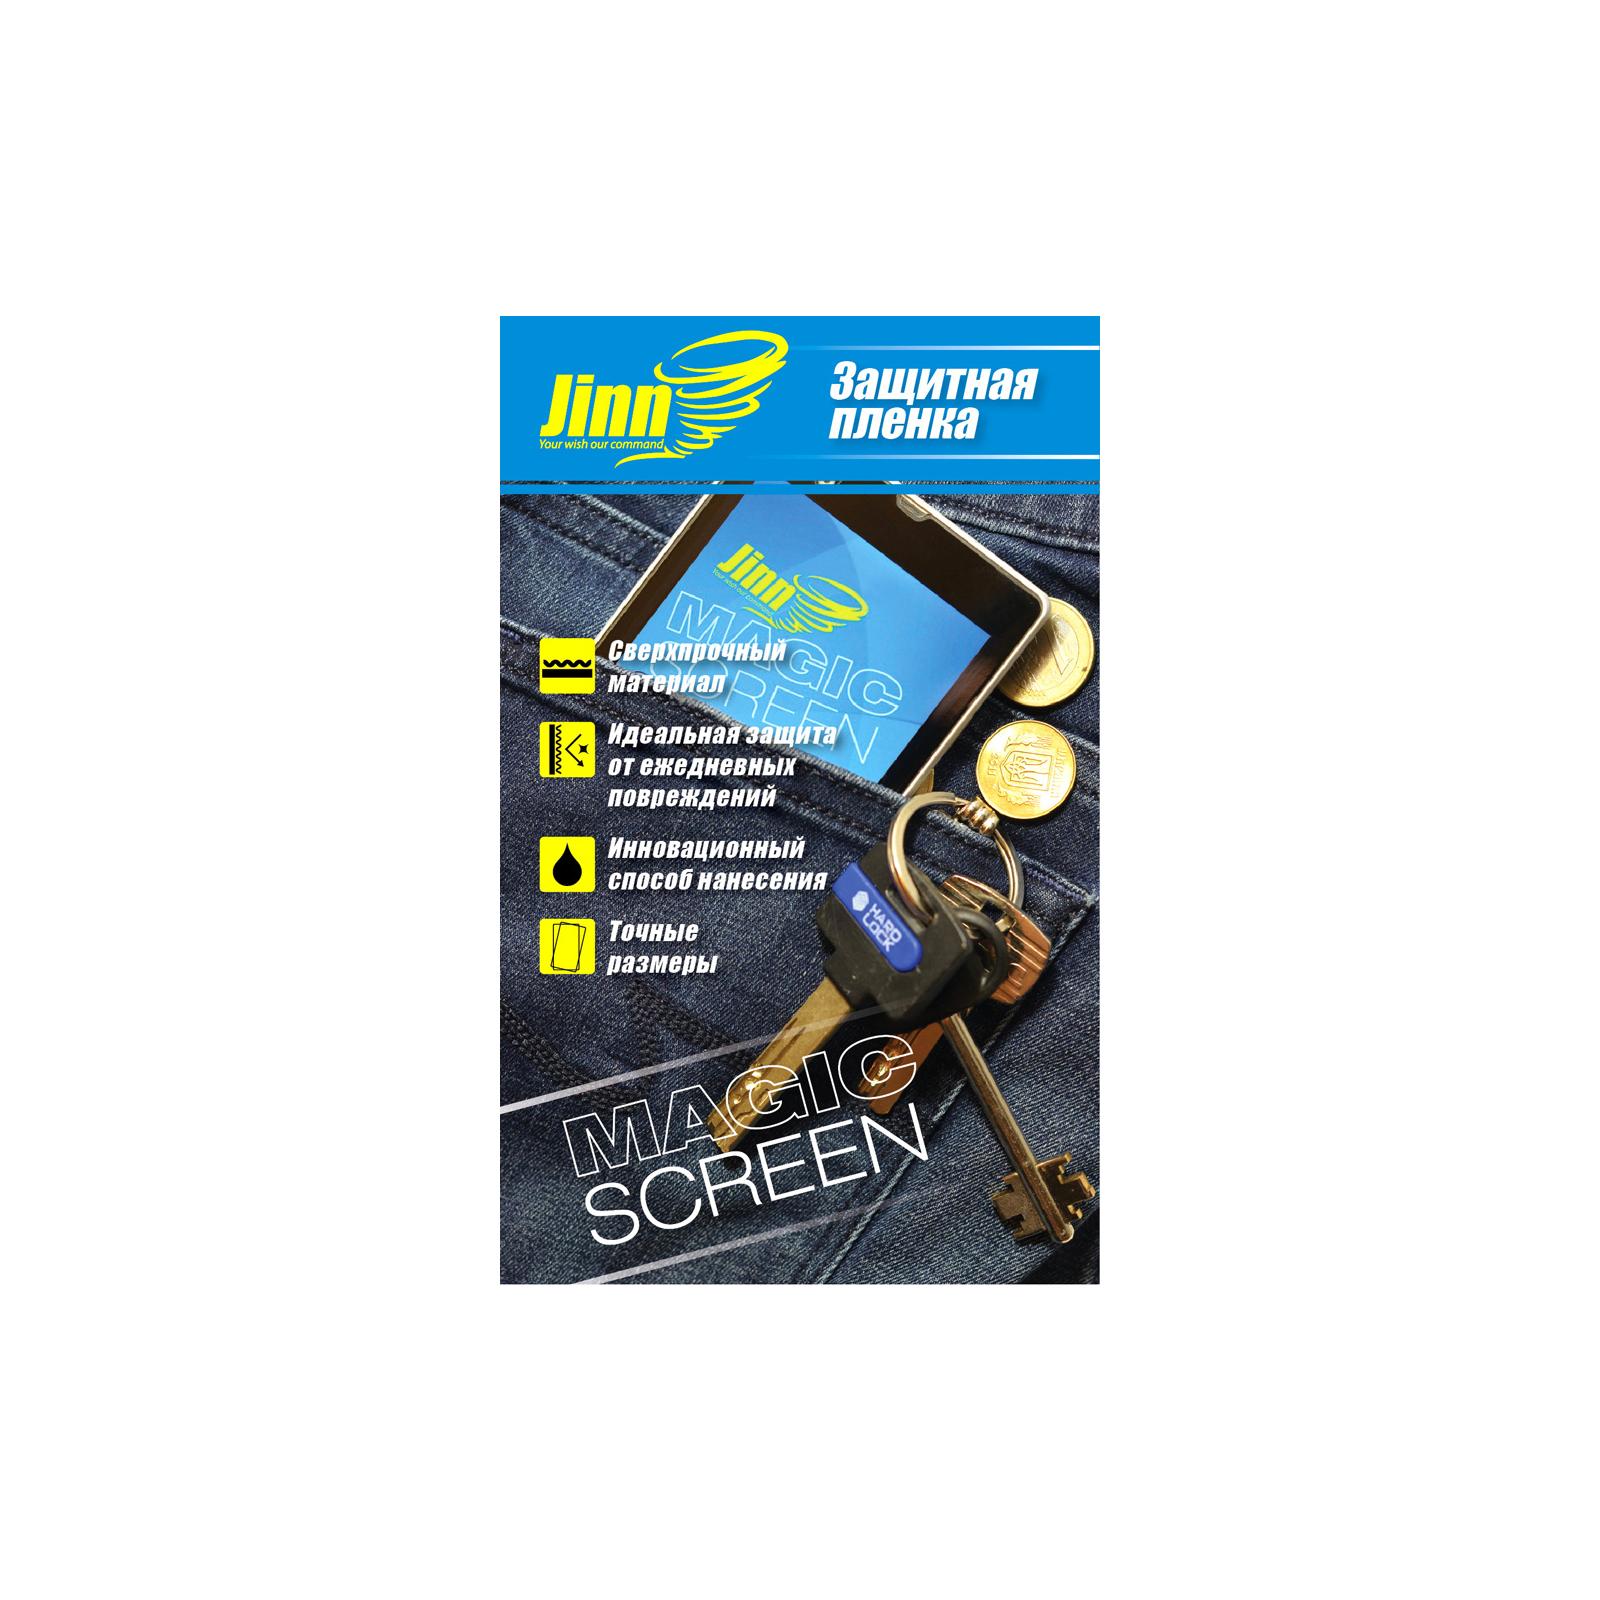 Пленка защитная JINN ультрапрочная Magic Screen для Lenovo IdeaPhone A680 (Lenovo IdeaPhone A680 front)